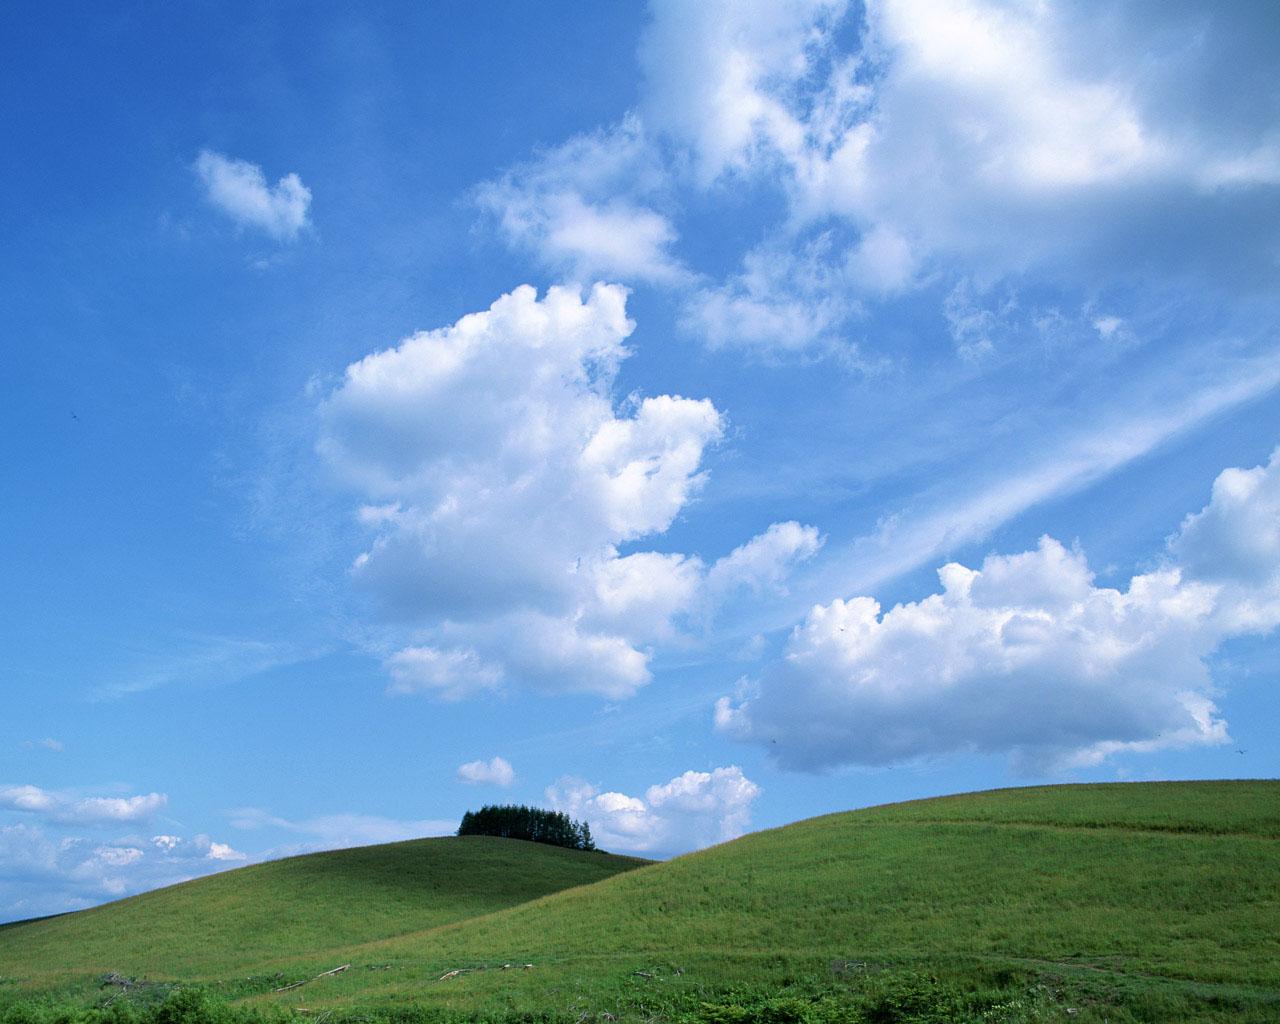 Sky And Cloud Free Hd Wallpaper 174